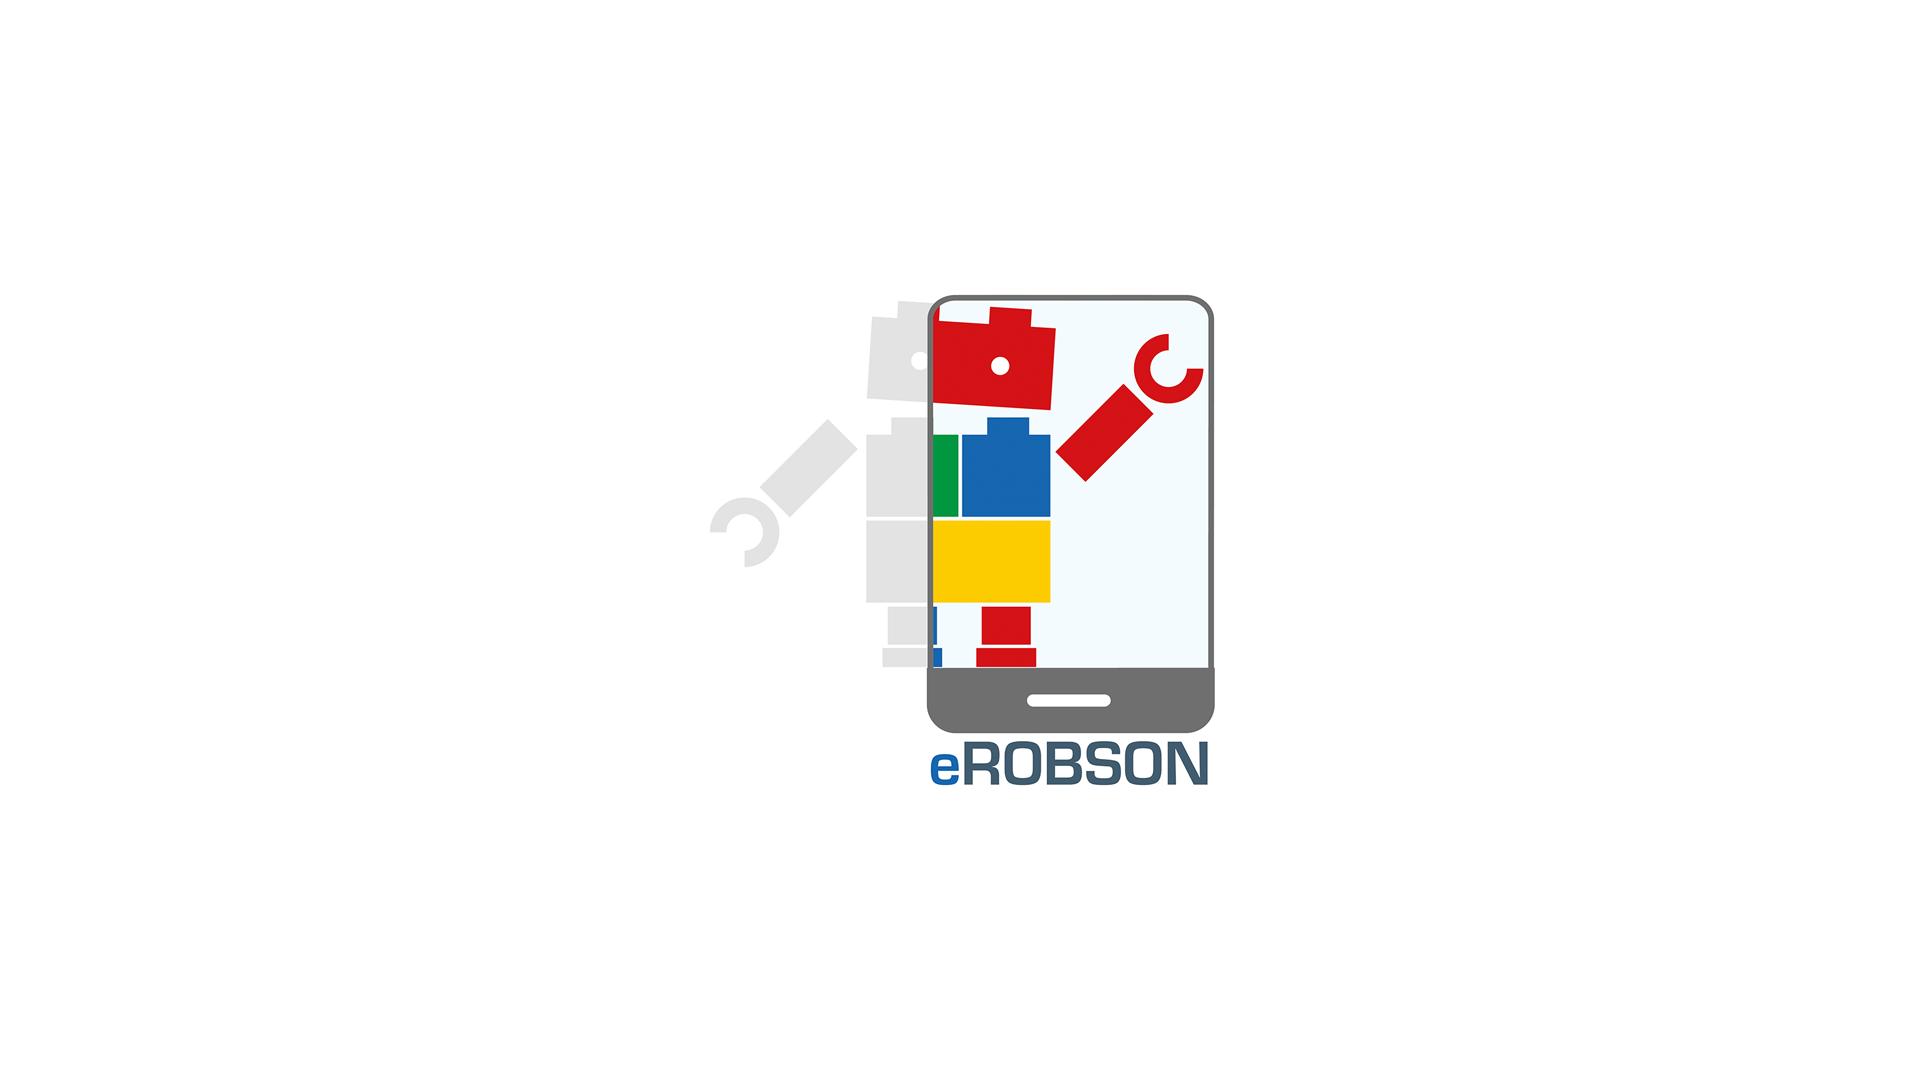 eRobson